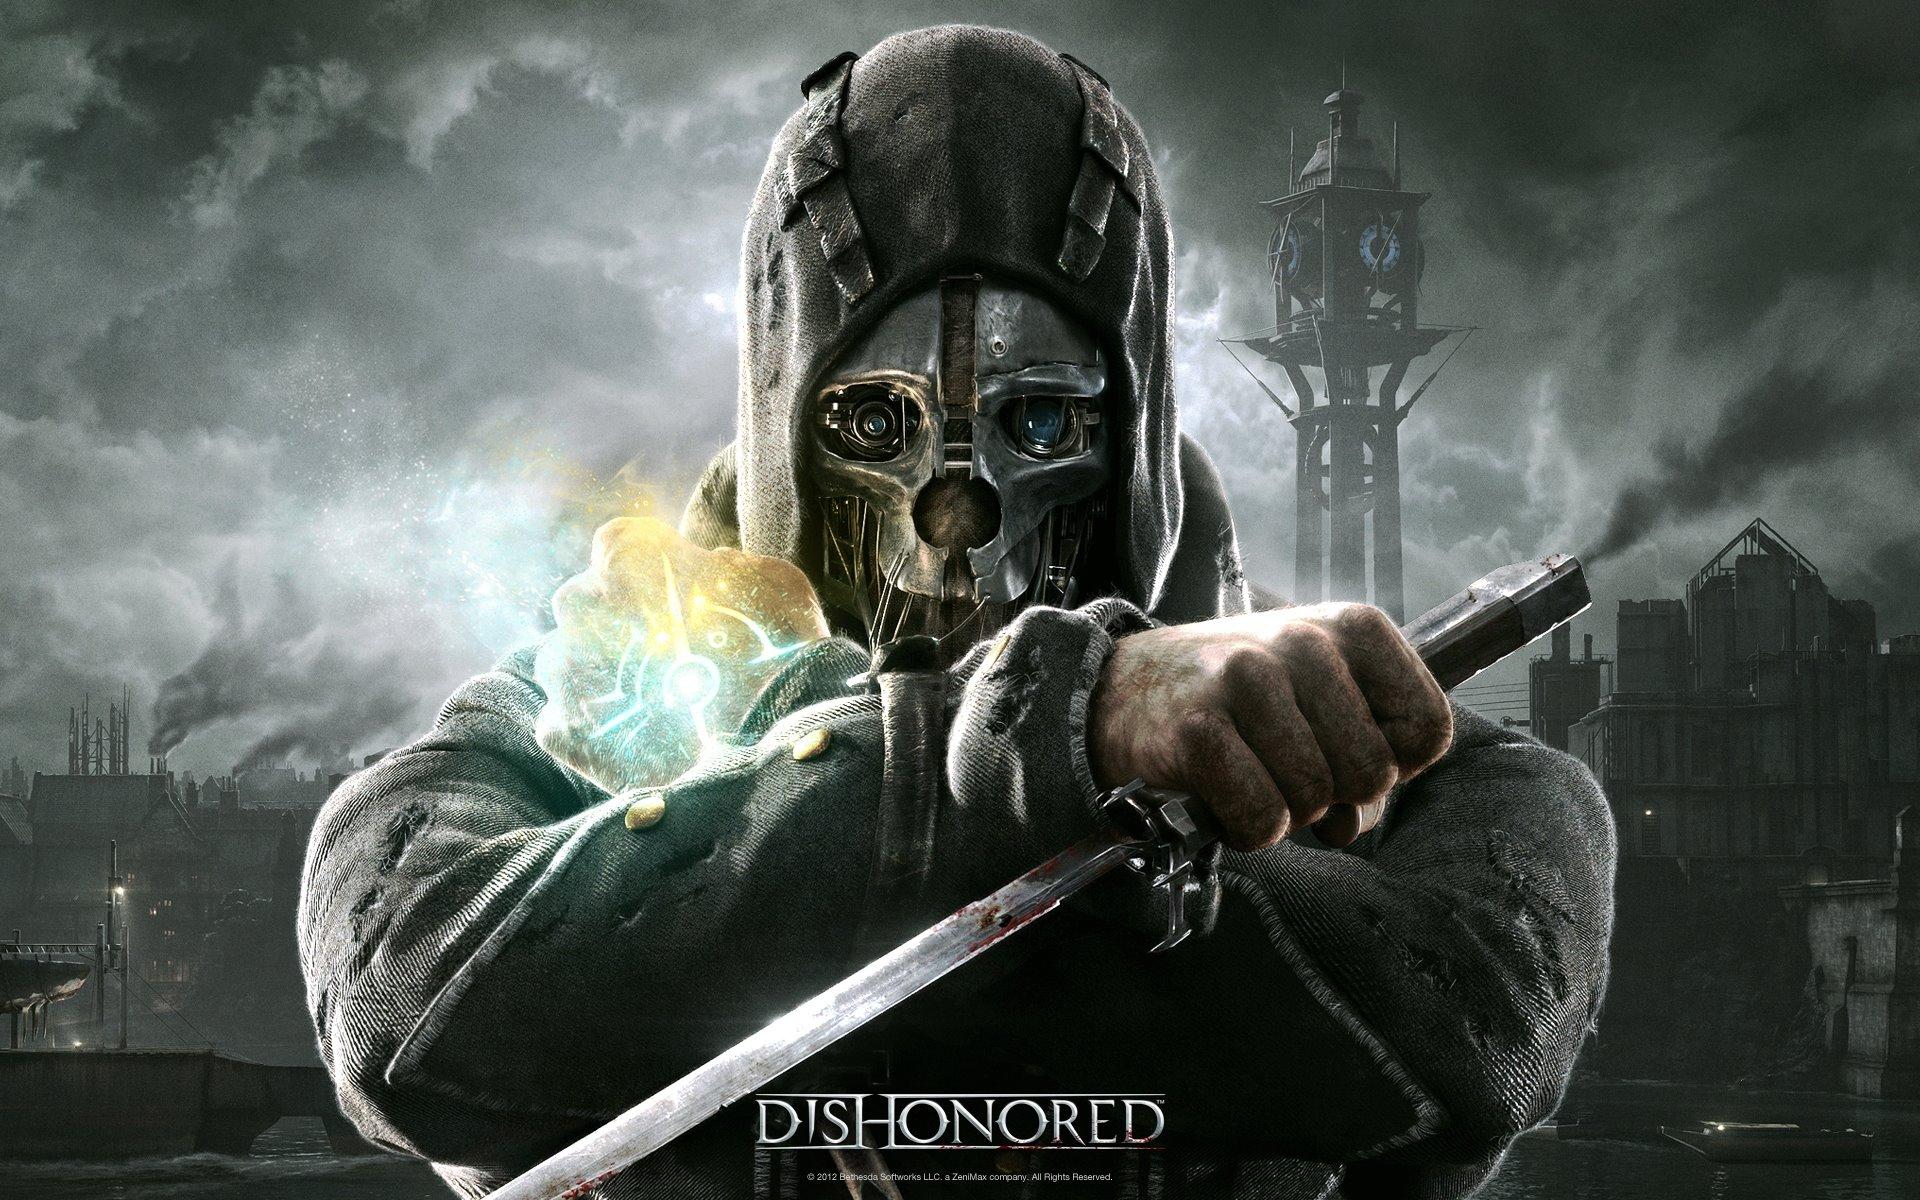 2012 Dishonored